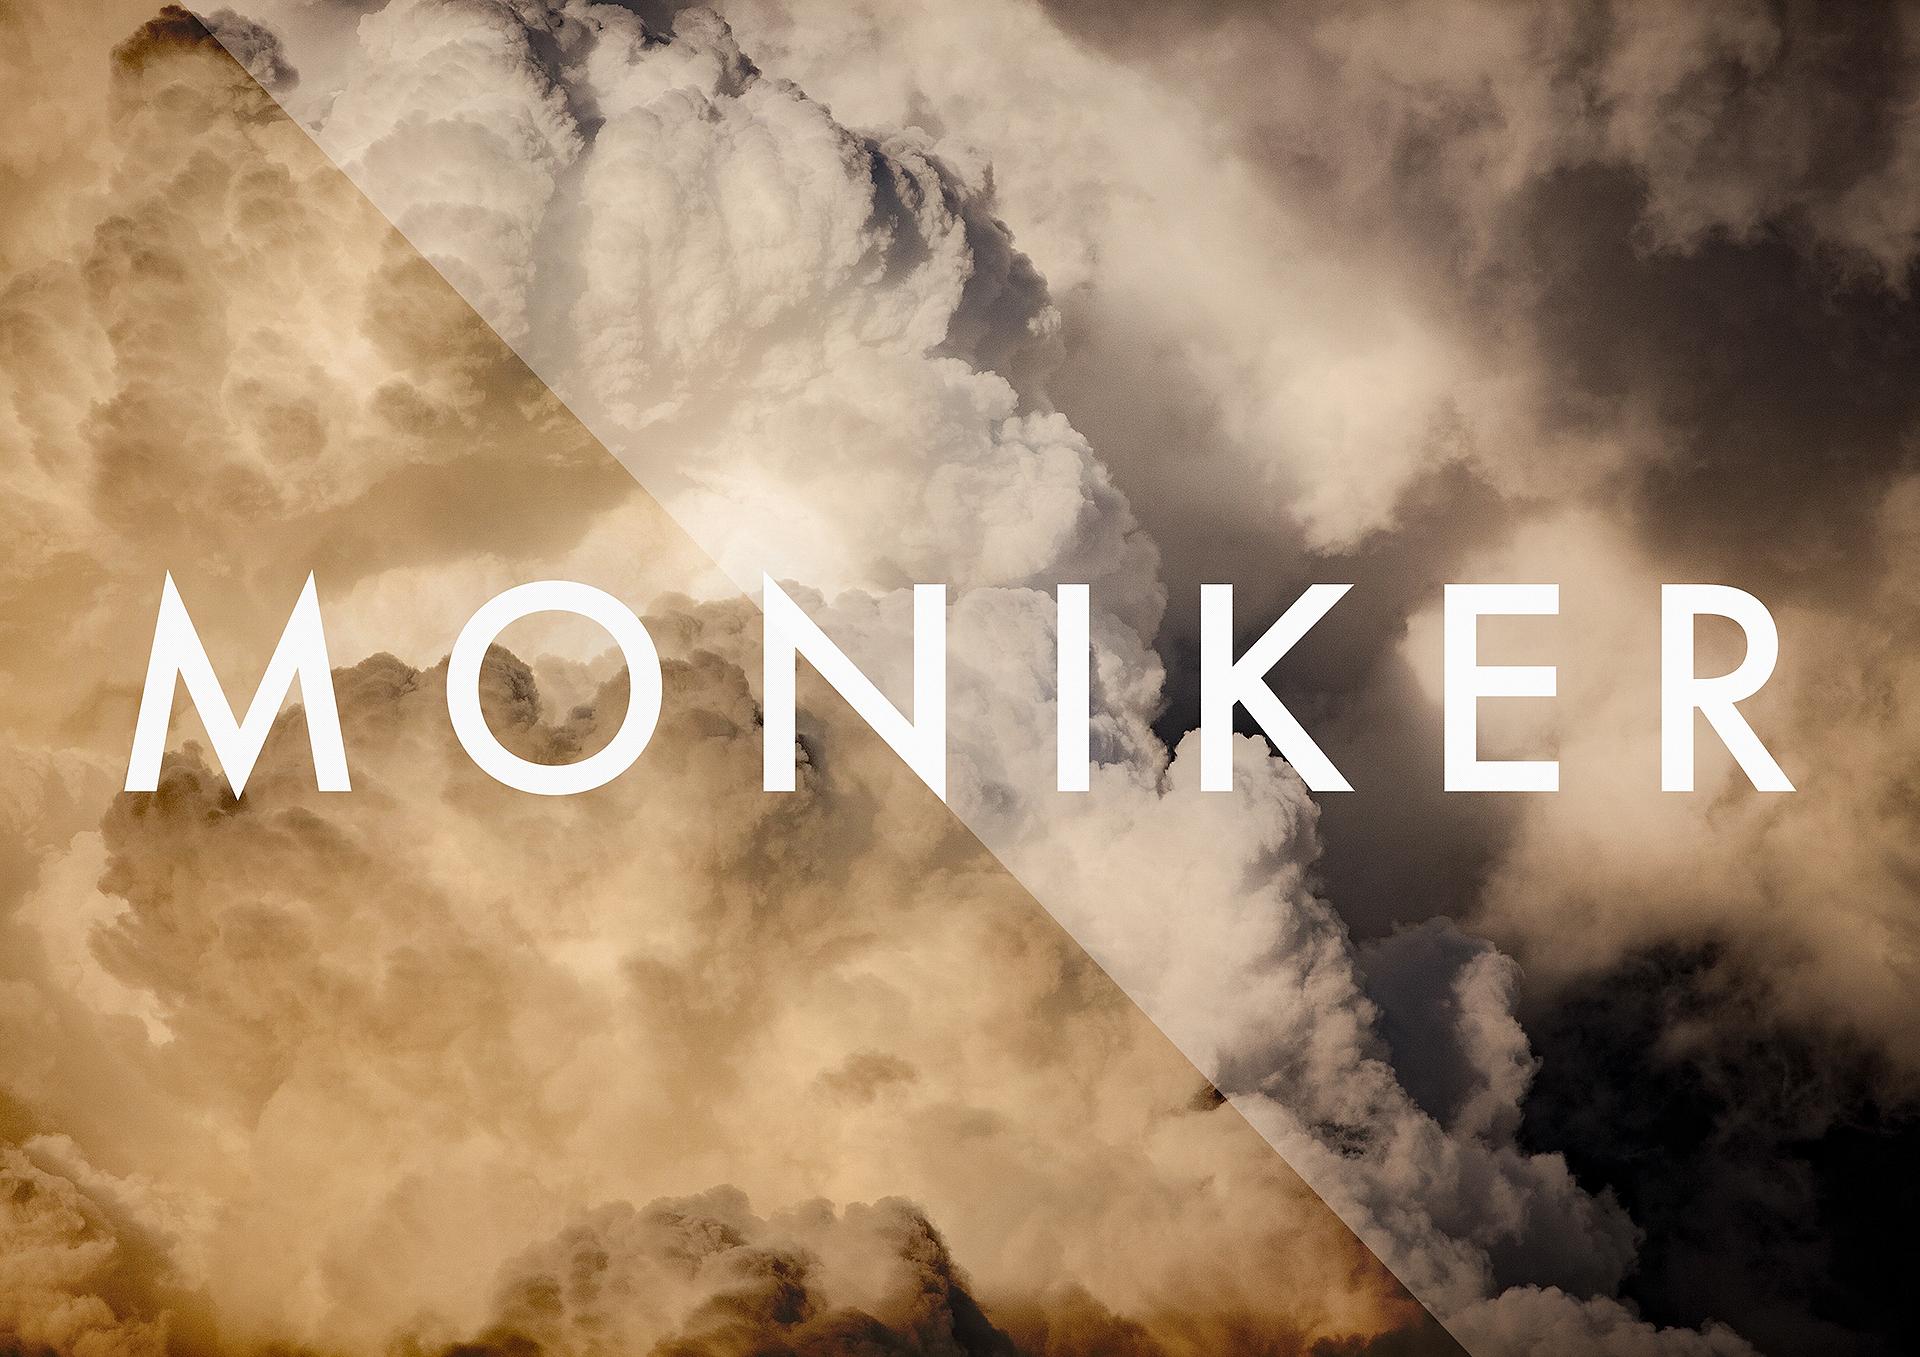 Moniker 1